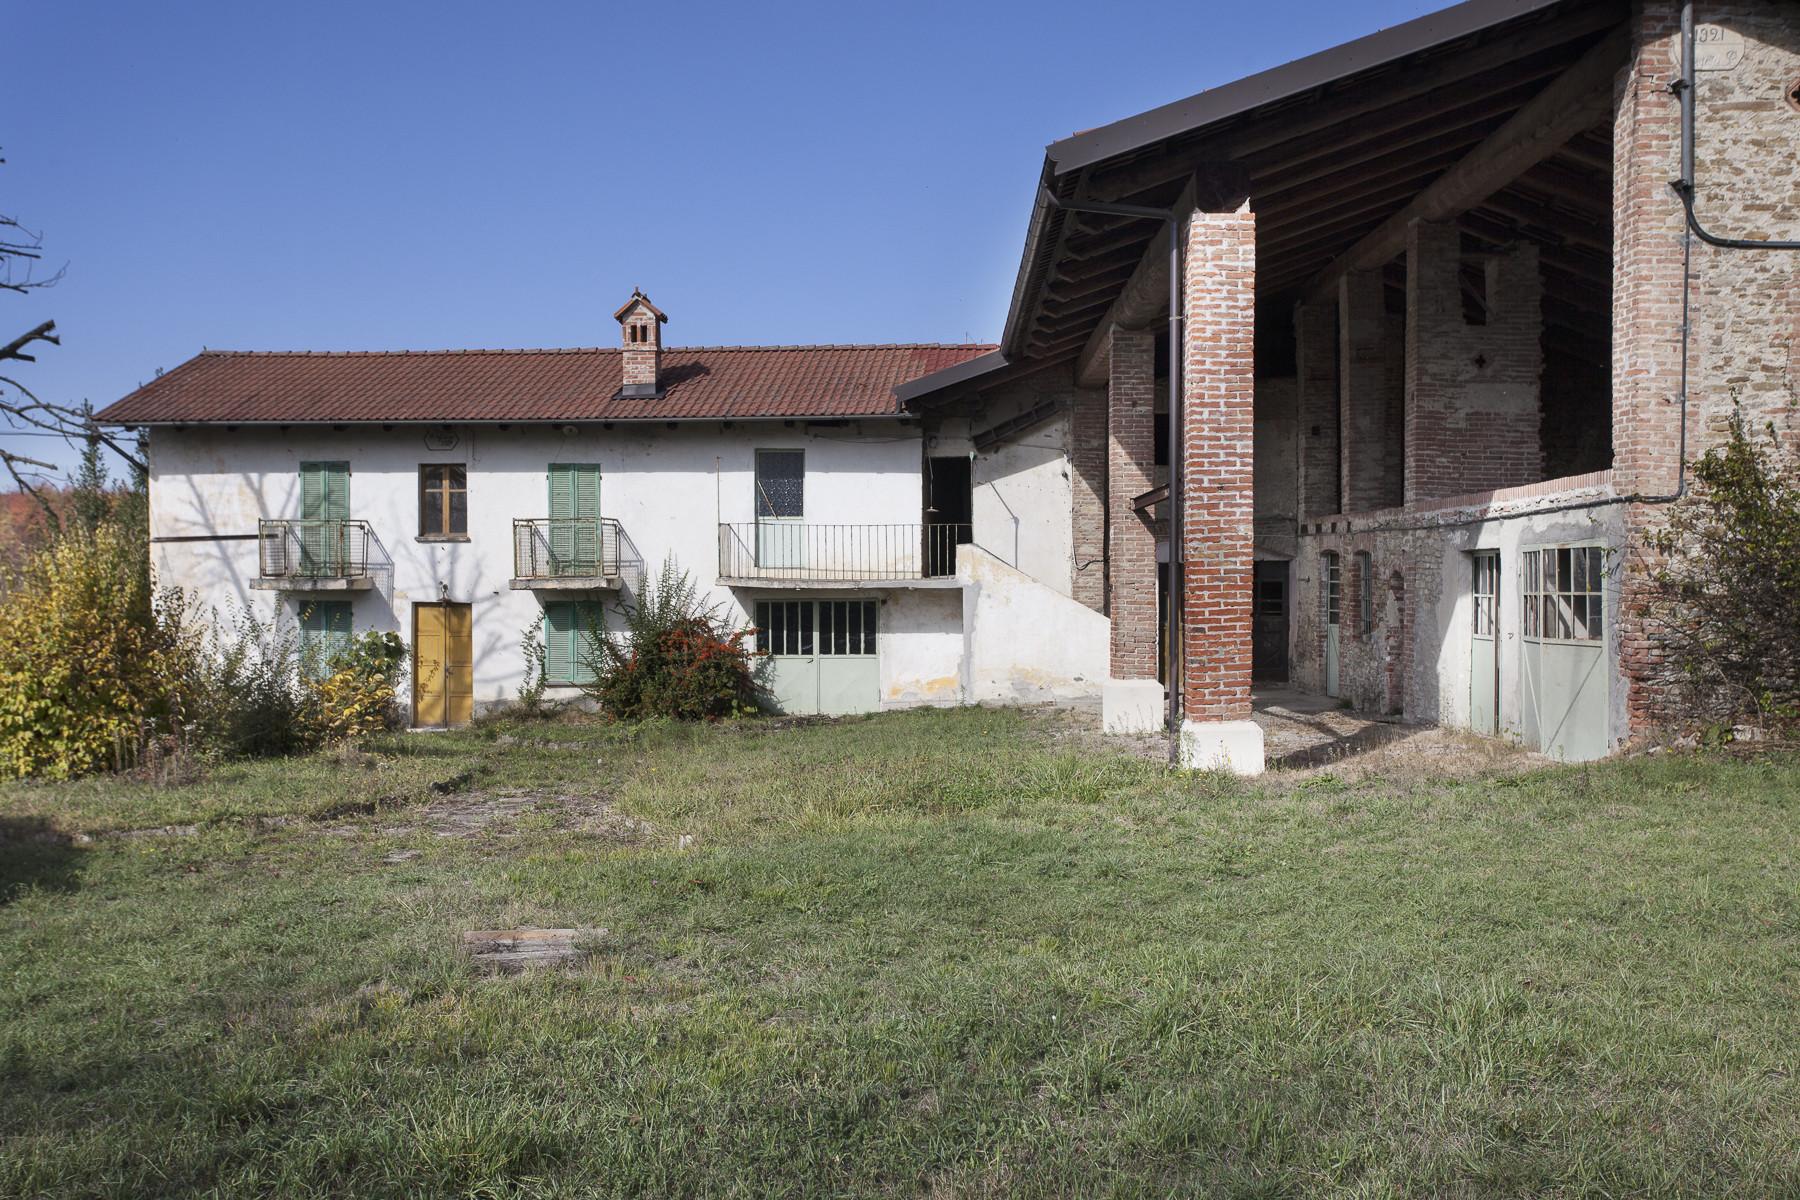 Villa in Vendita a Clavesana: 5 locali, 1130 mq - Foto 6